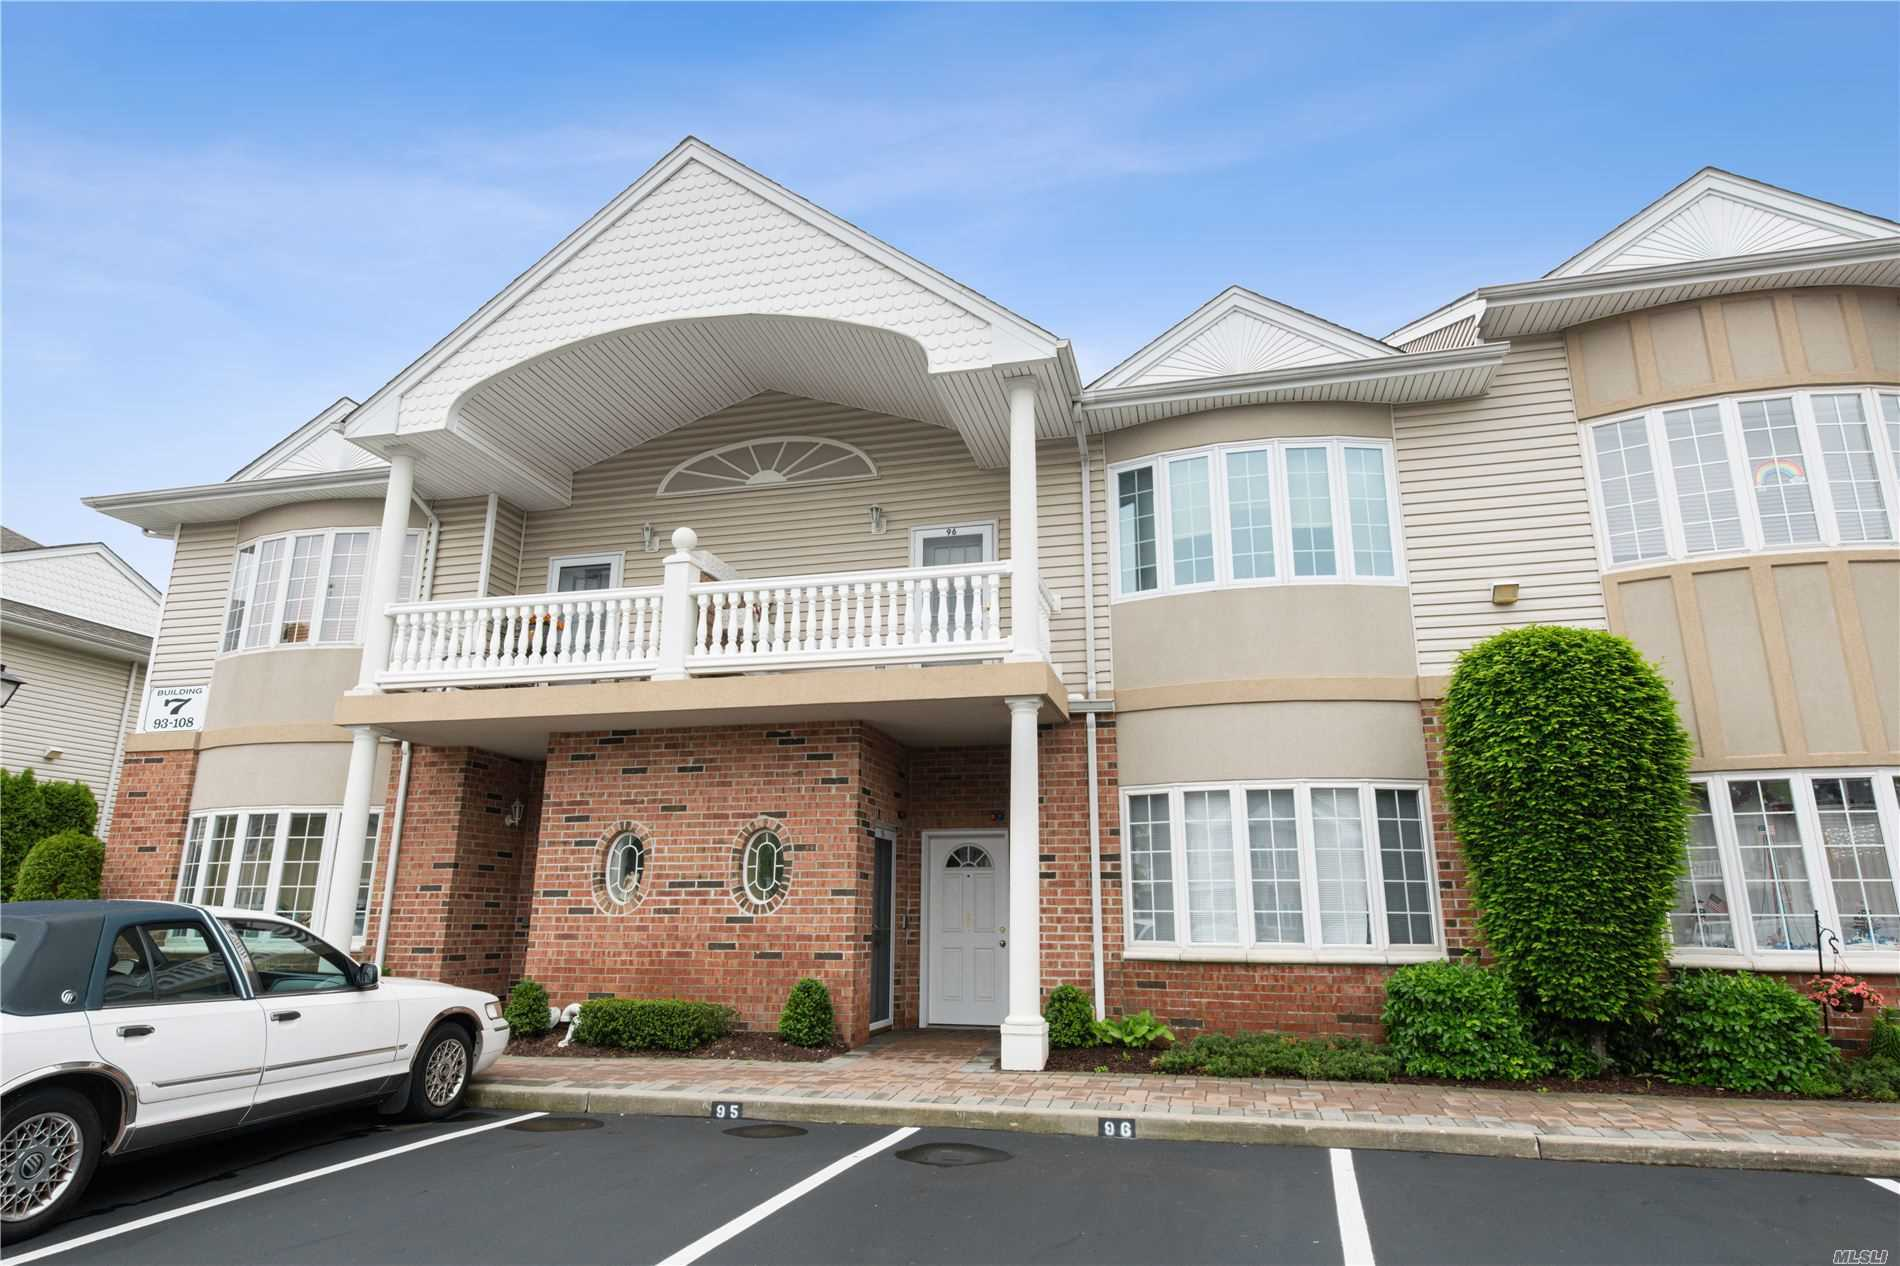 Property for sale at 96 Francesca Way, Amityville NY 11701, Amityville,  New York 11701